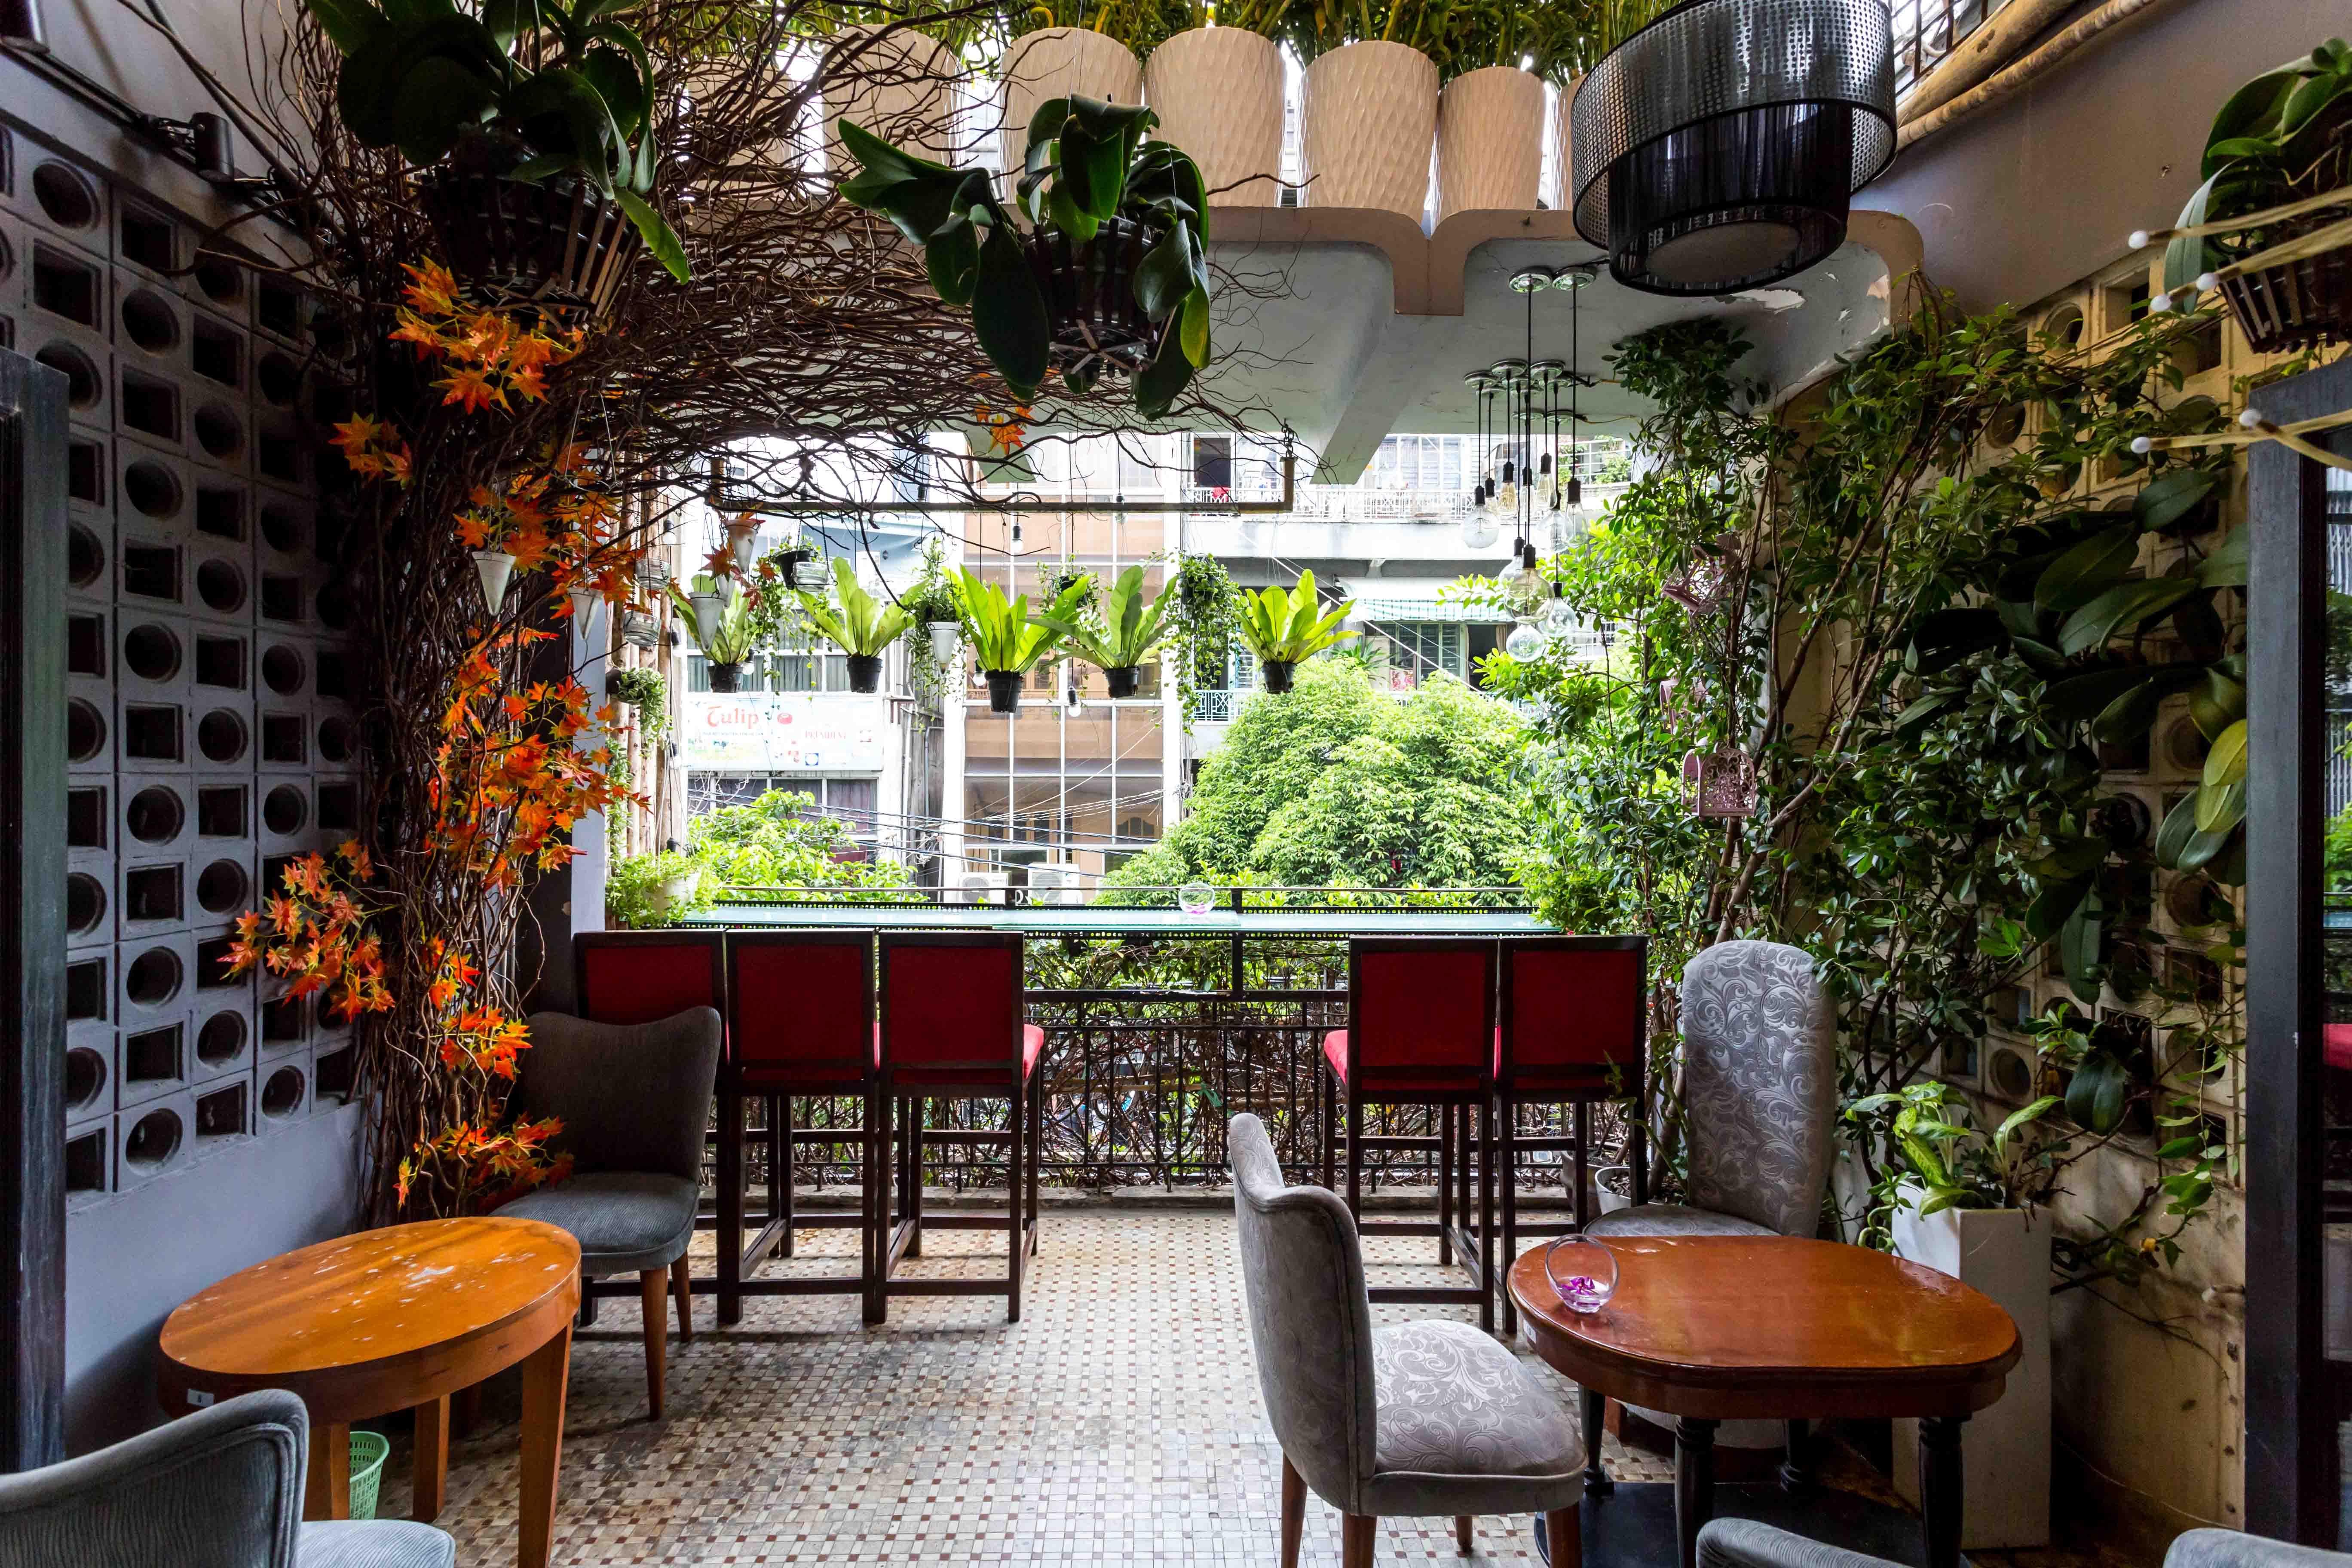 BD Florist & Cafe